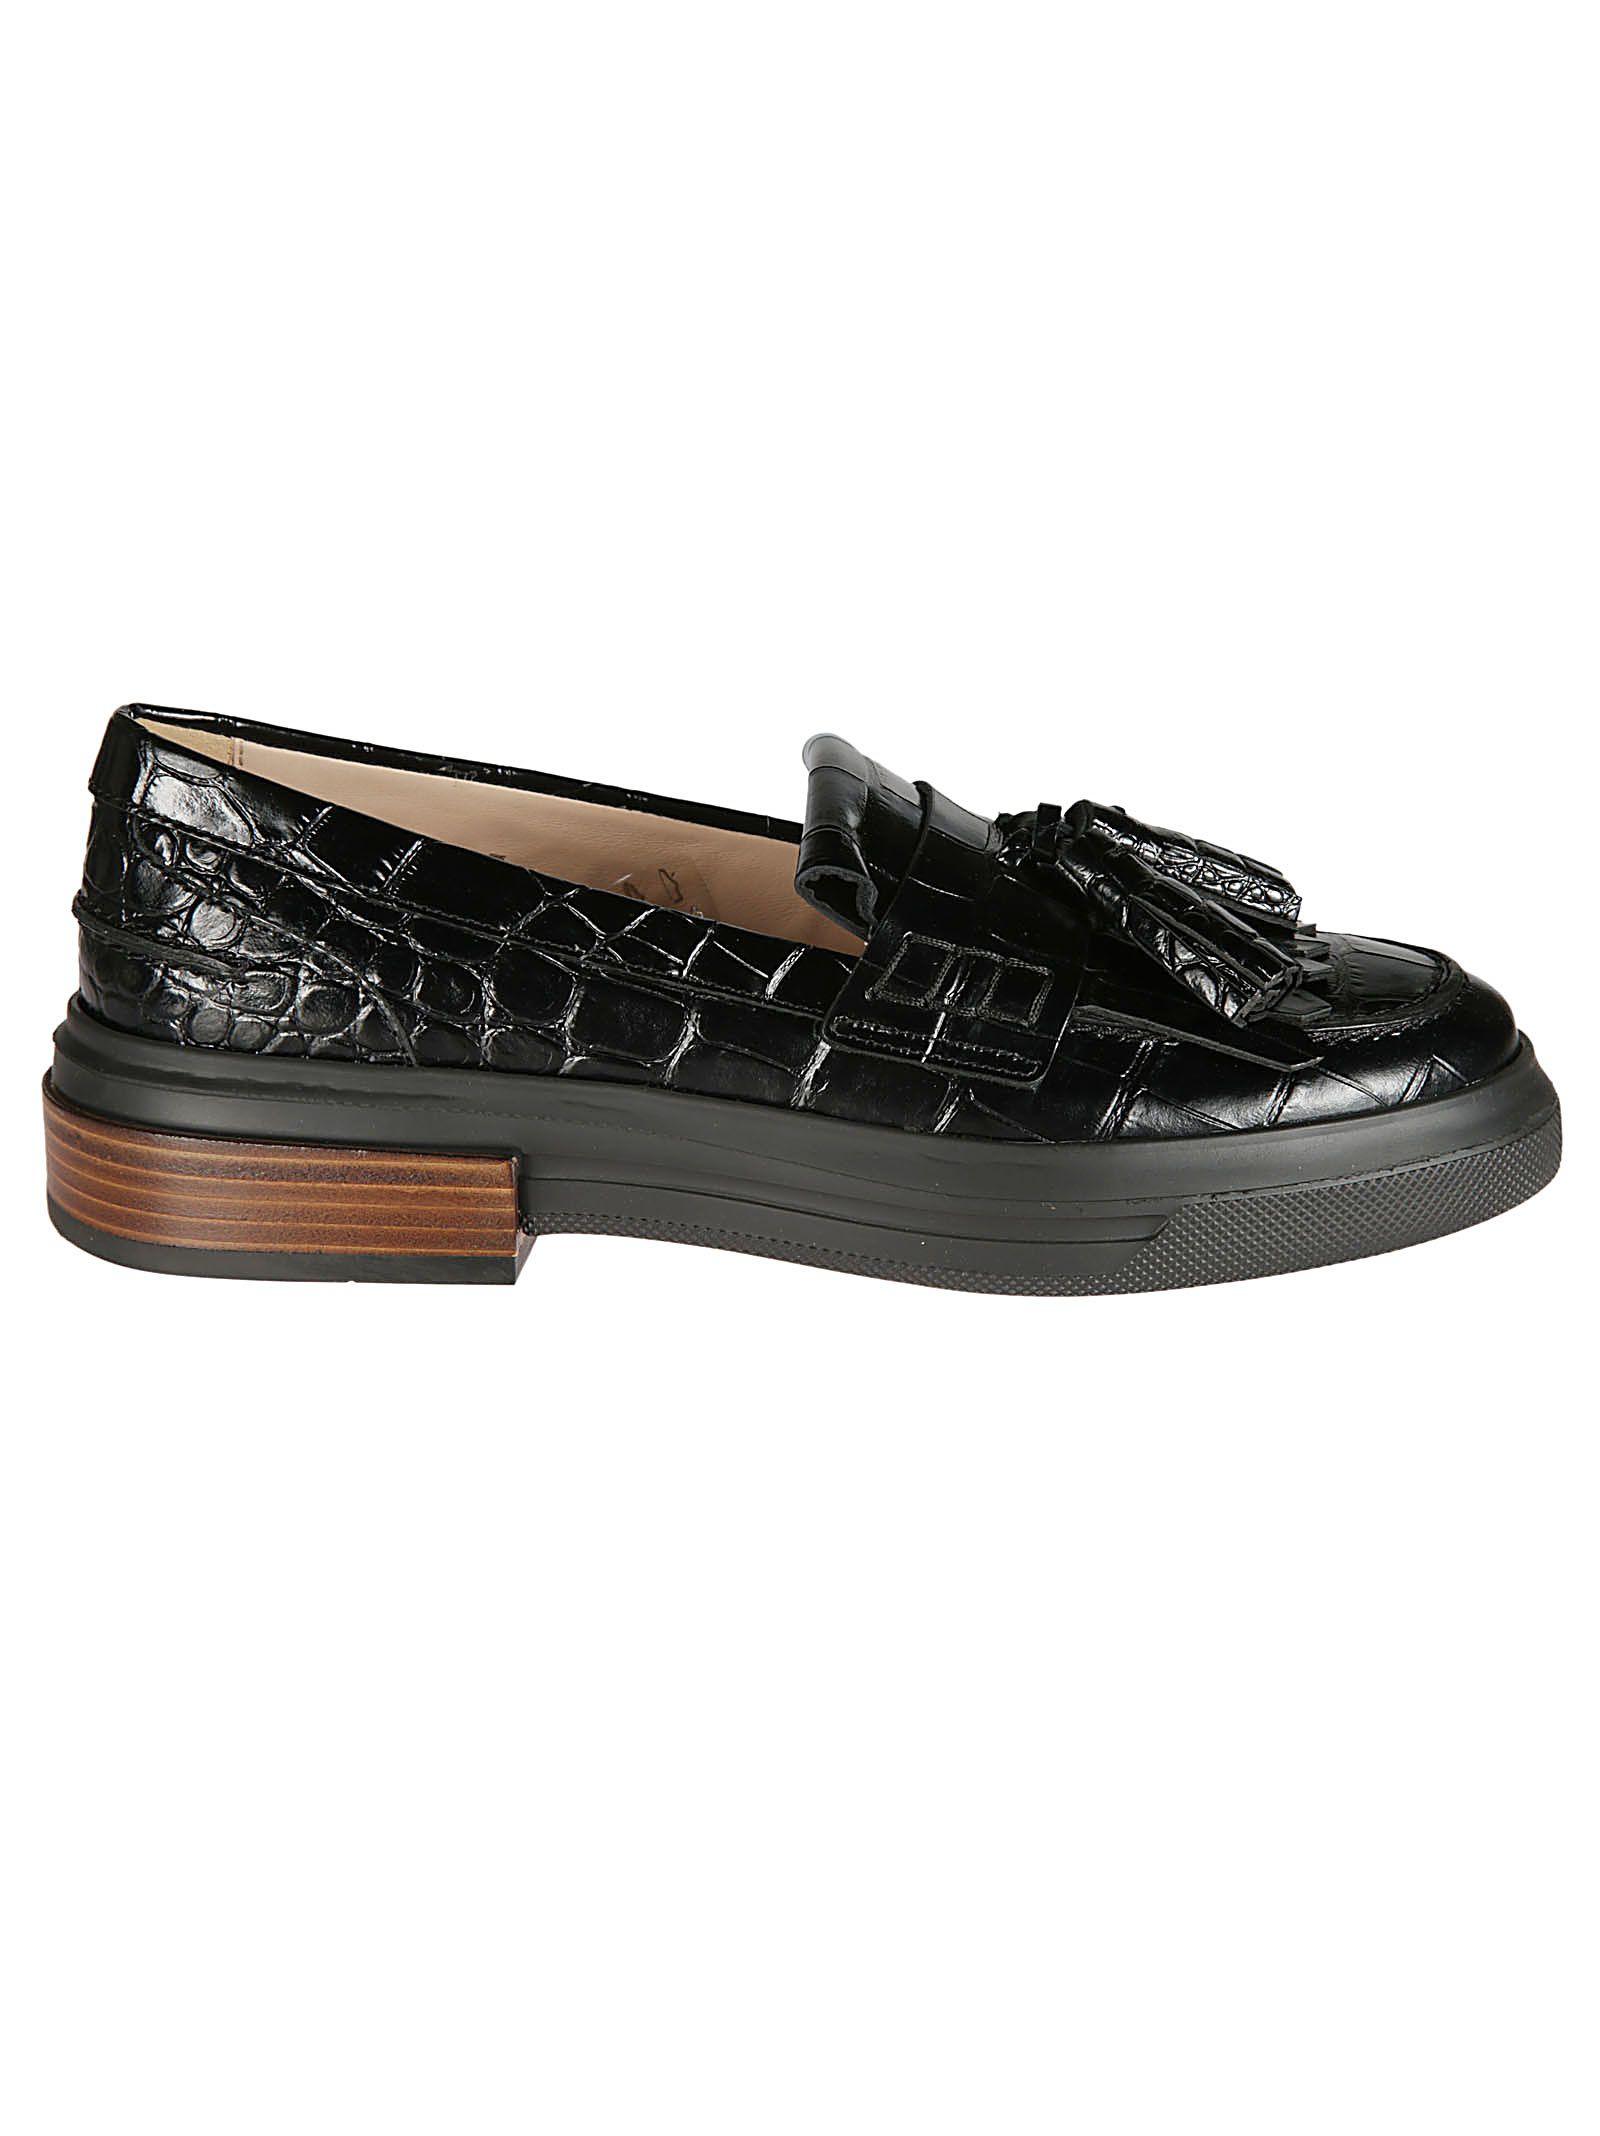 Tassel Detailed Crocodile Loafers in Black